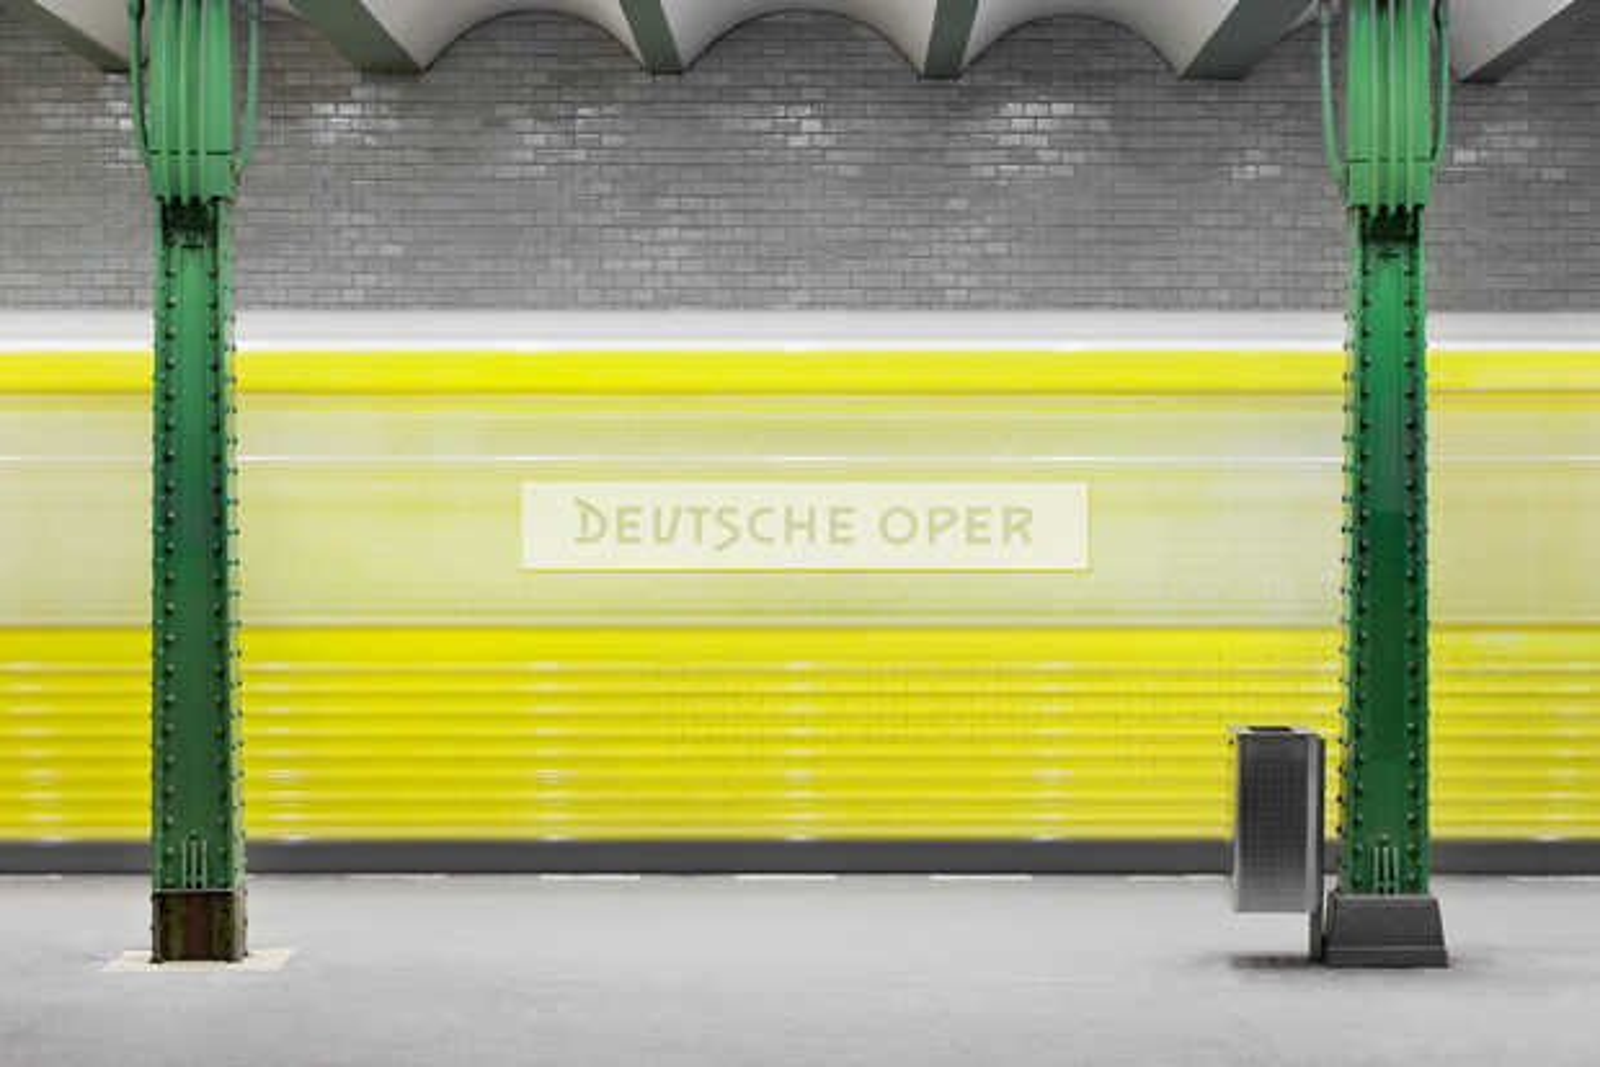 Deutsche Oper - Annika Feuss